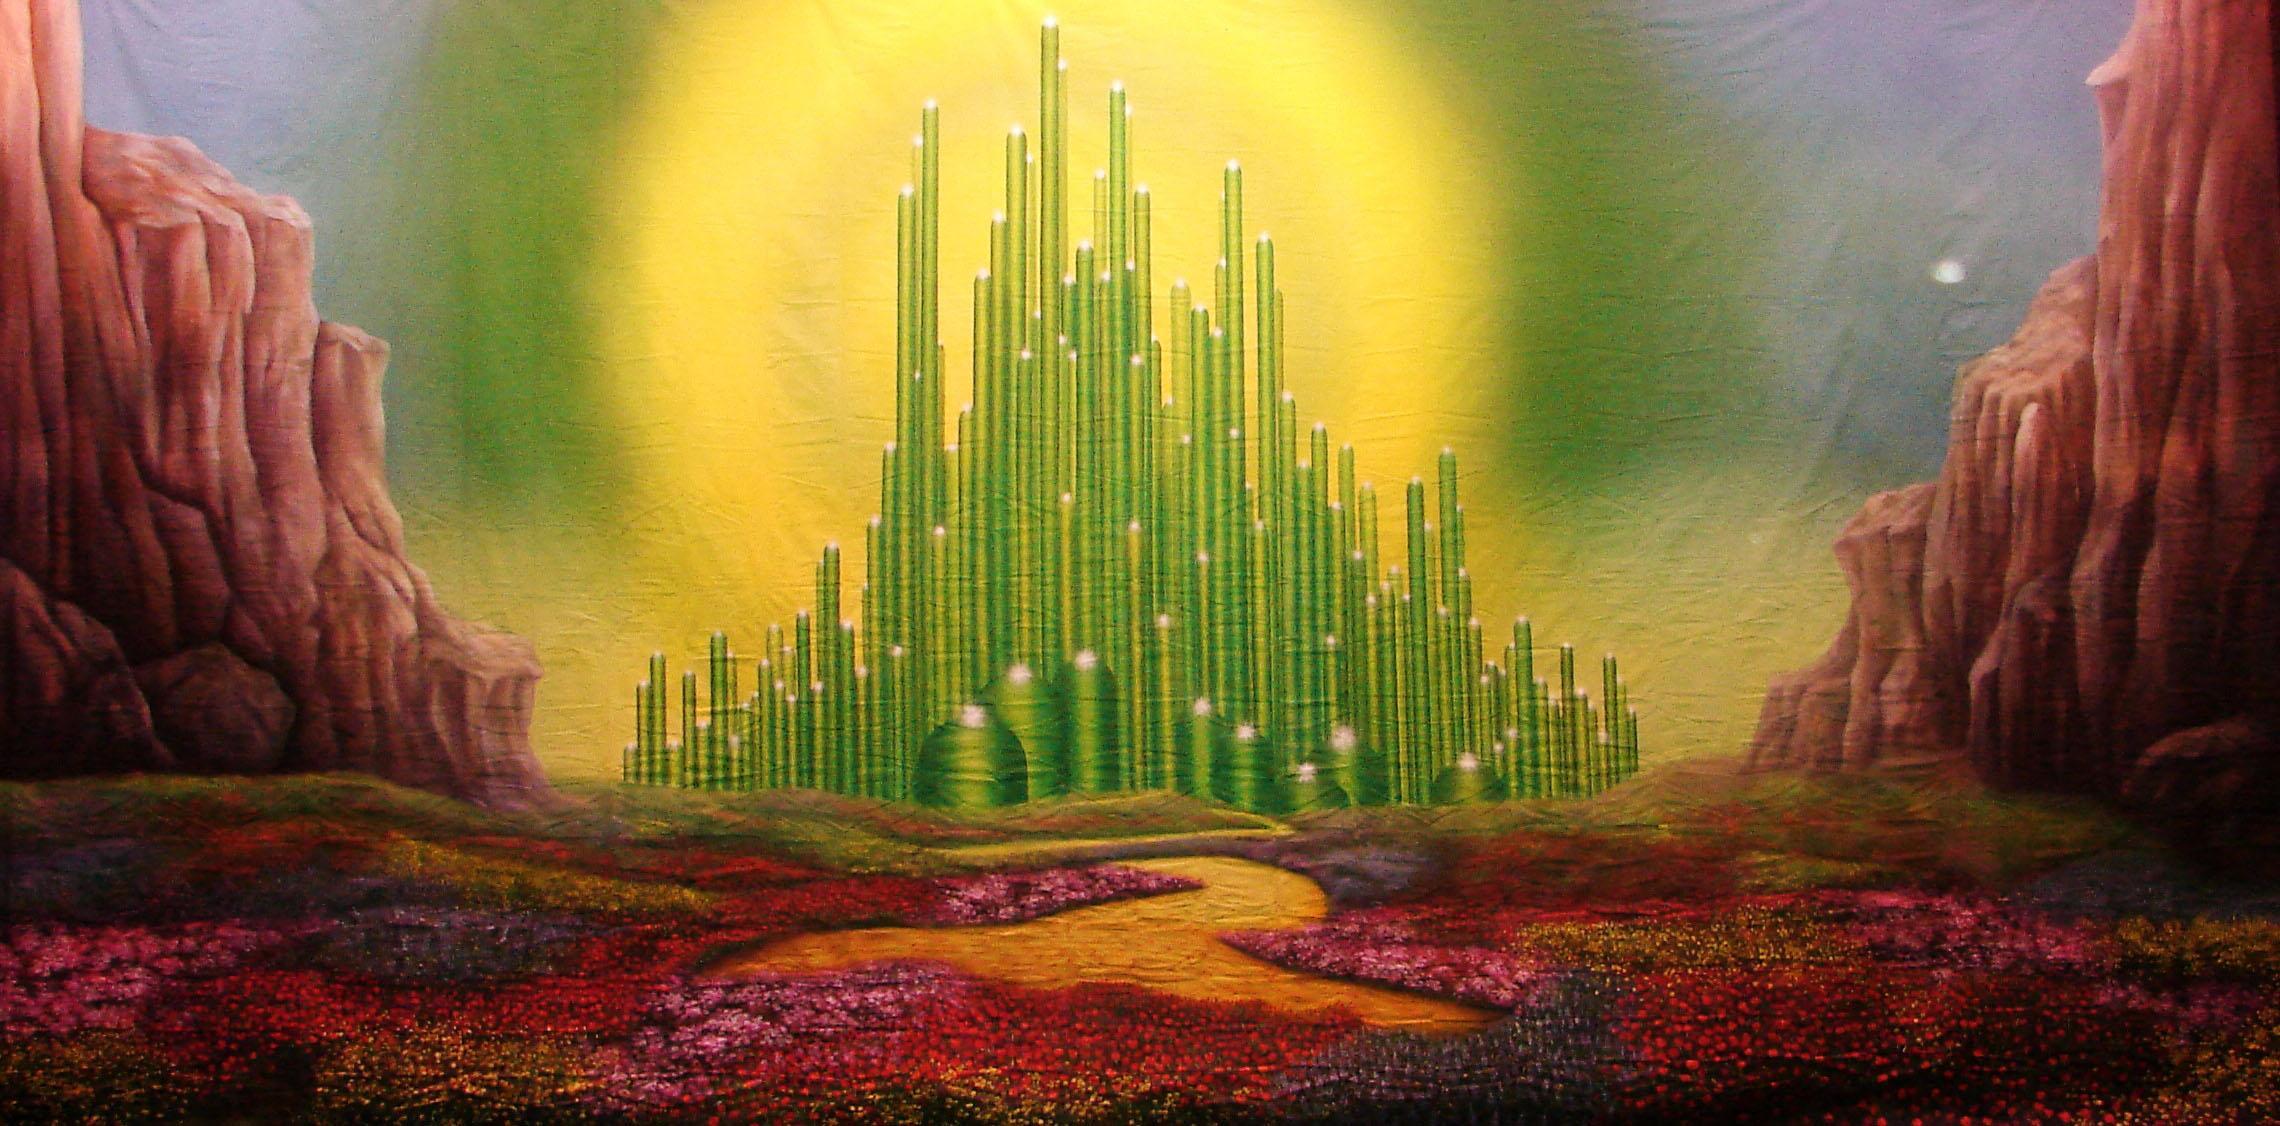 Wizard Of Oz Emerald City Wallpaper Viewing Gallery wallpaper uploaded 2280x1126